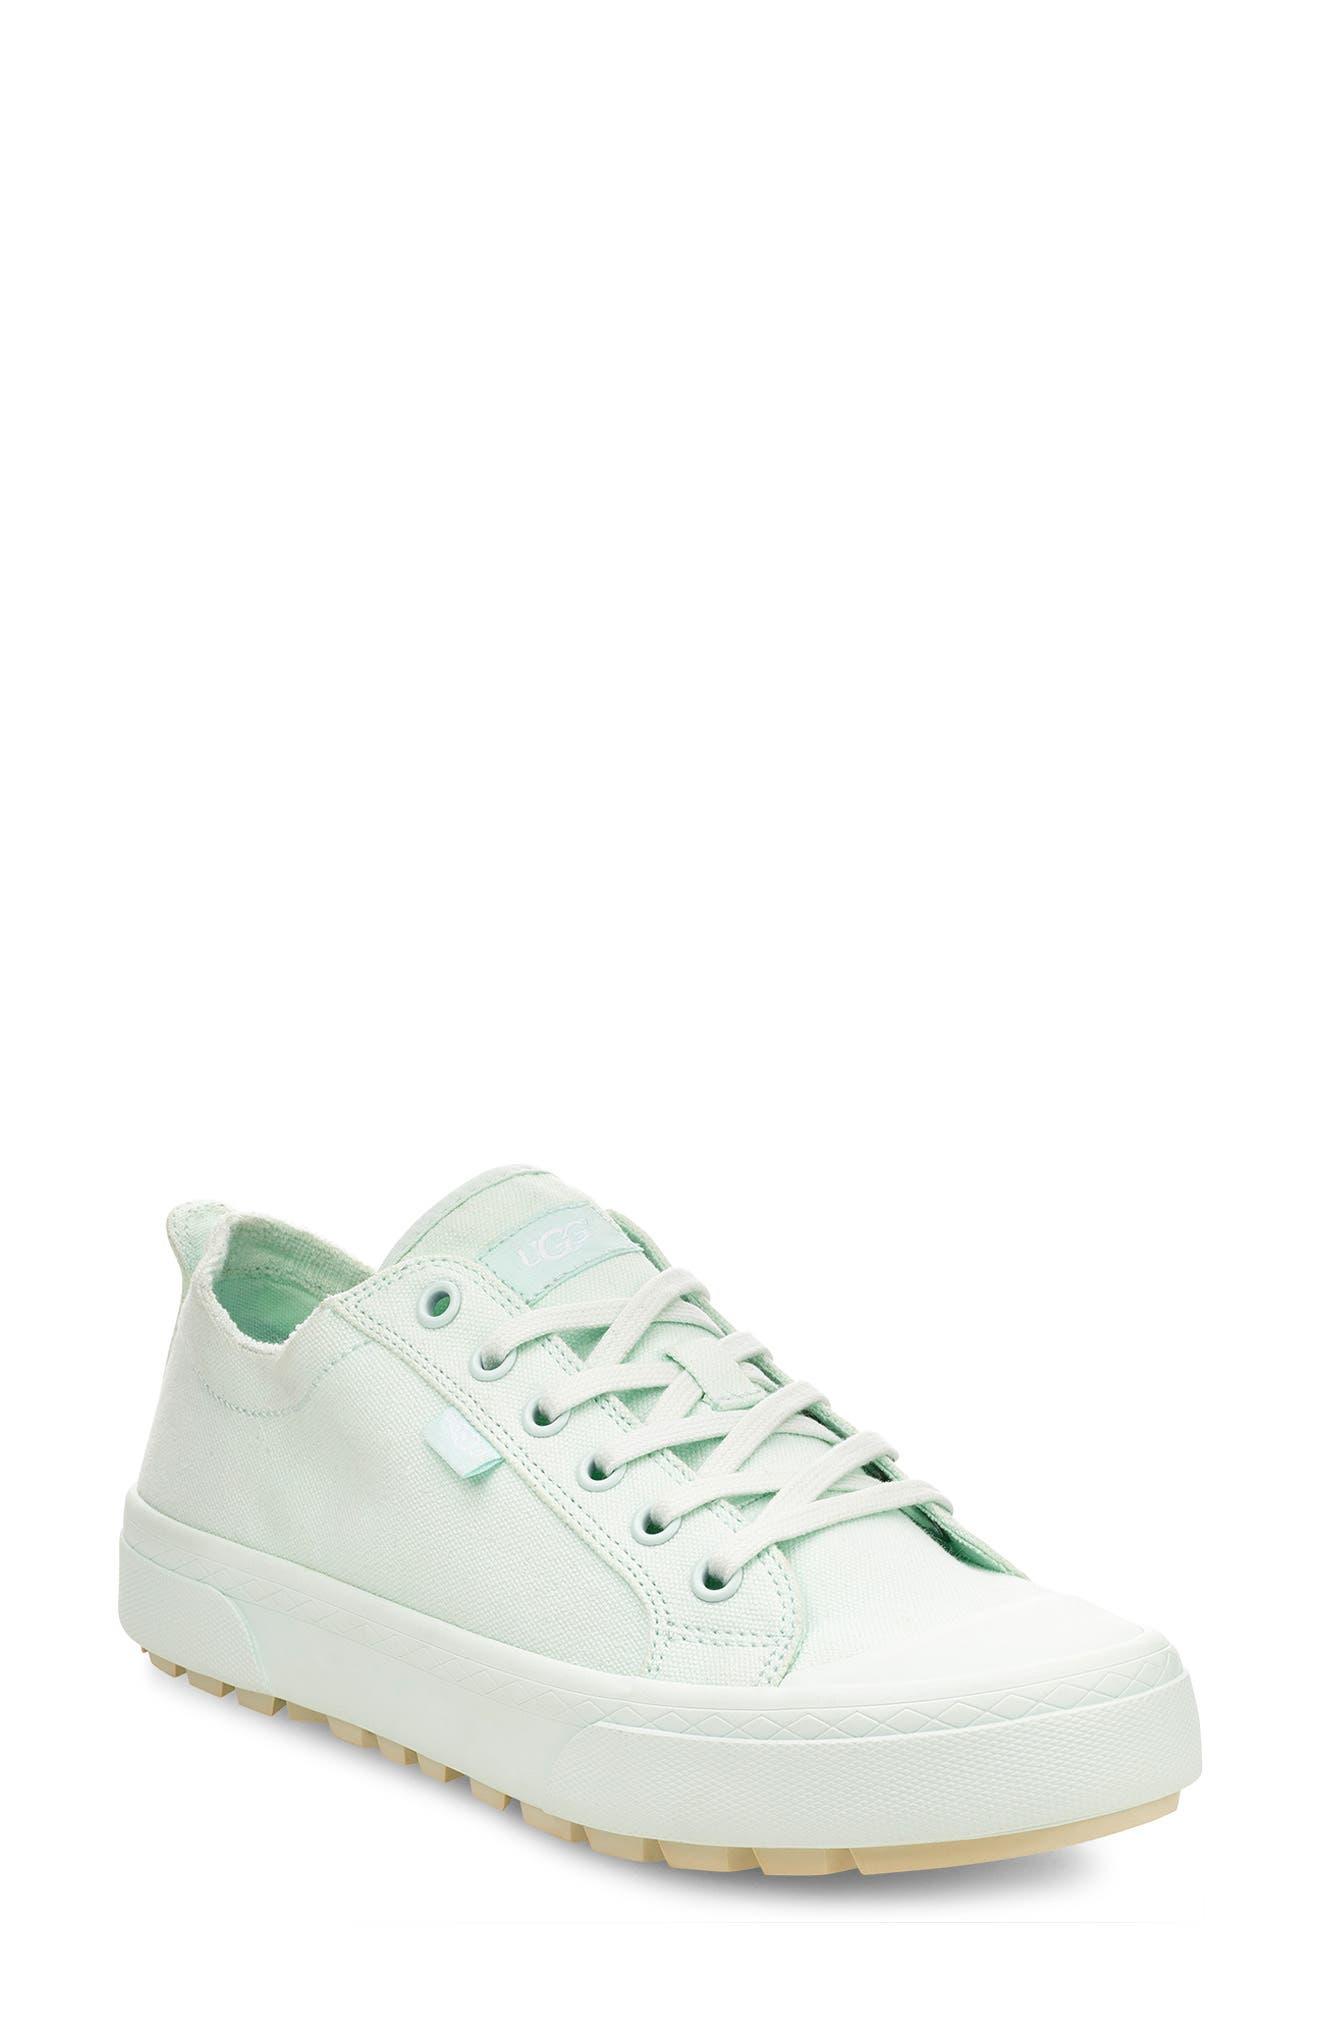 Ugg Aries Platform Sneaker- Green